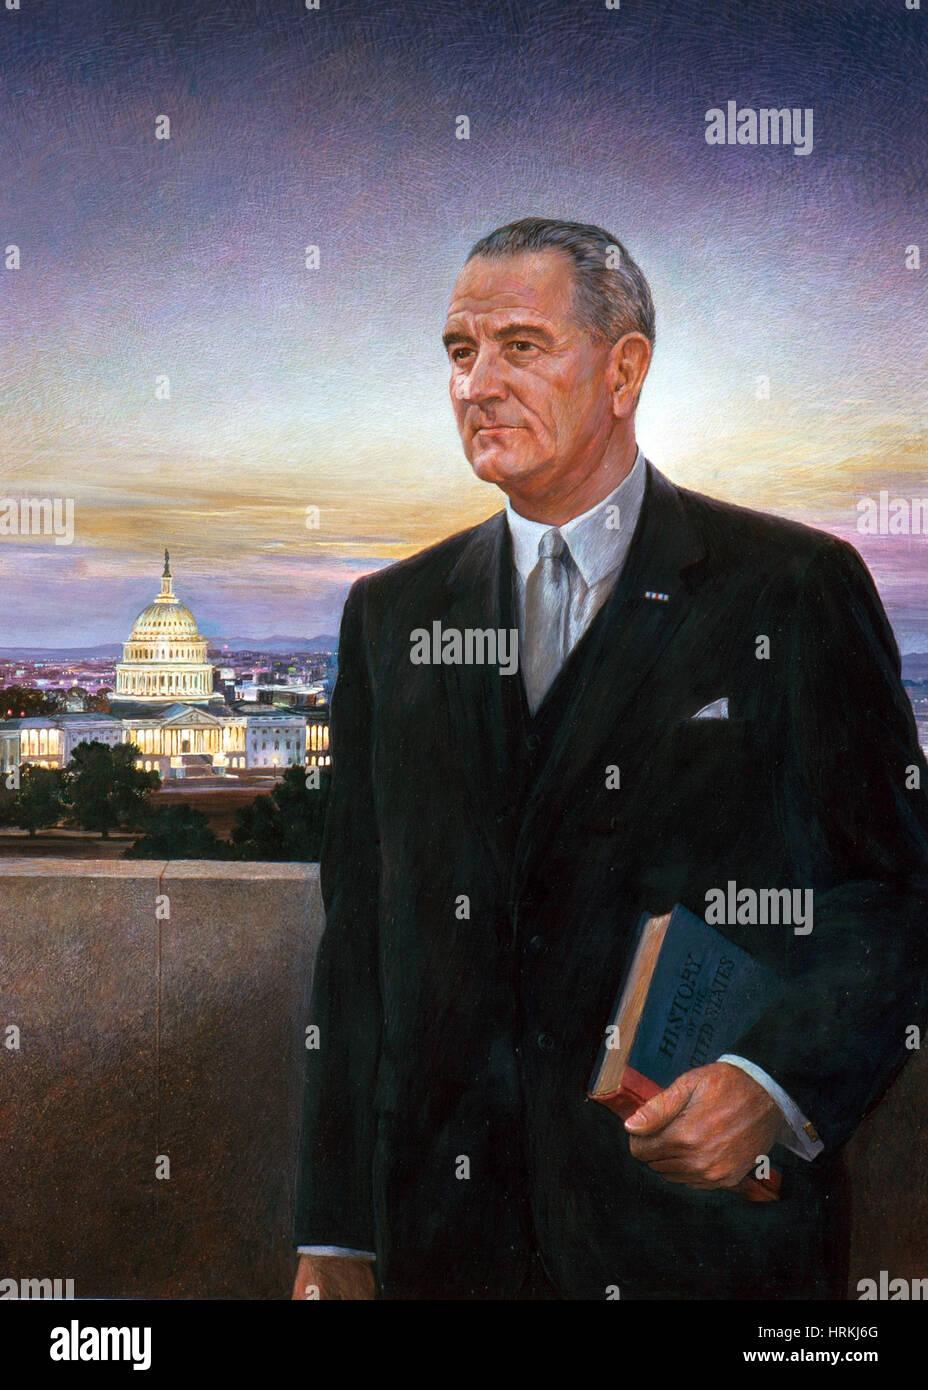 Lyndon B. Johnson, 36th U.S. President Stock Photo